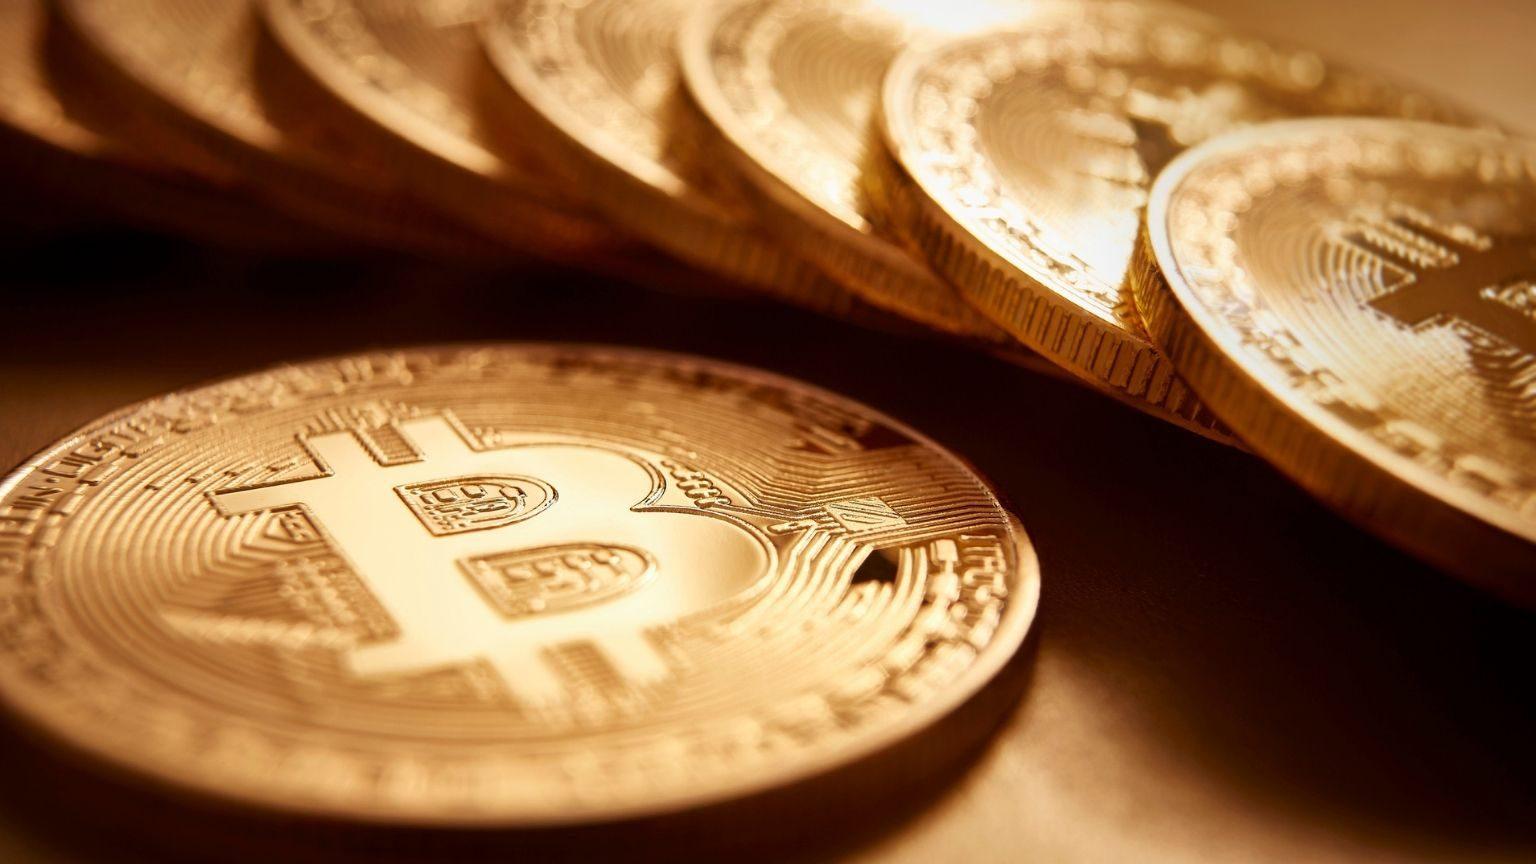 Pile of bitcoins